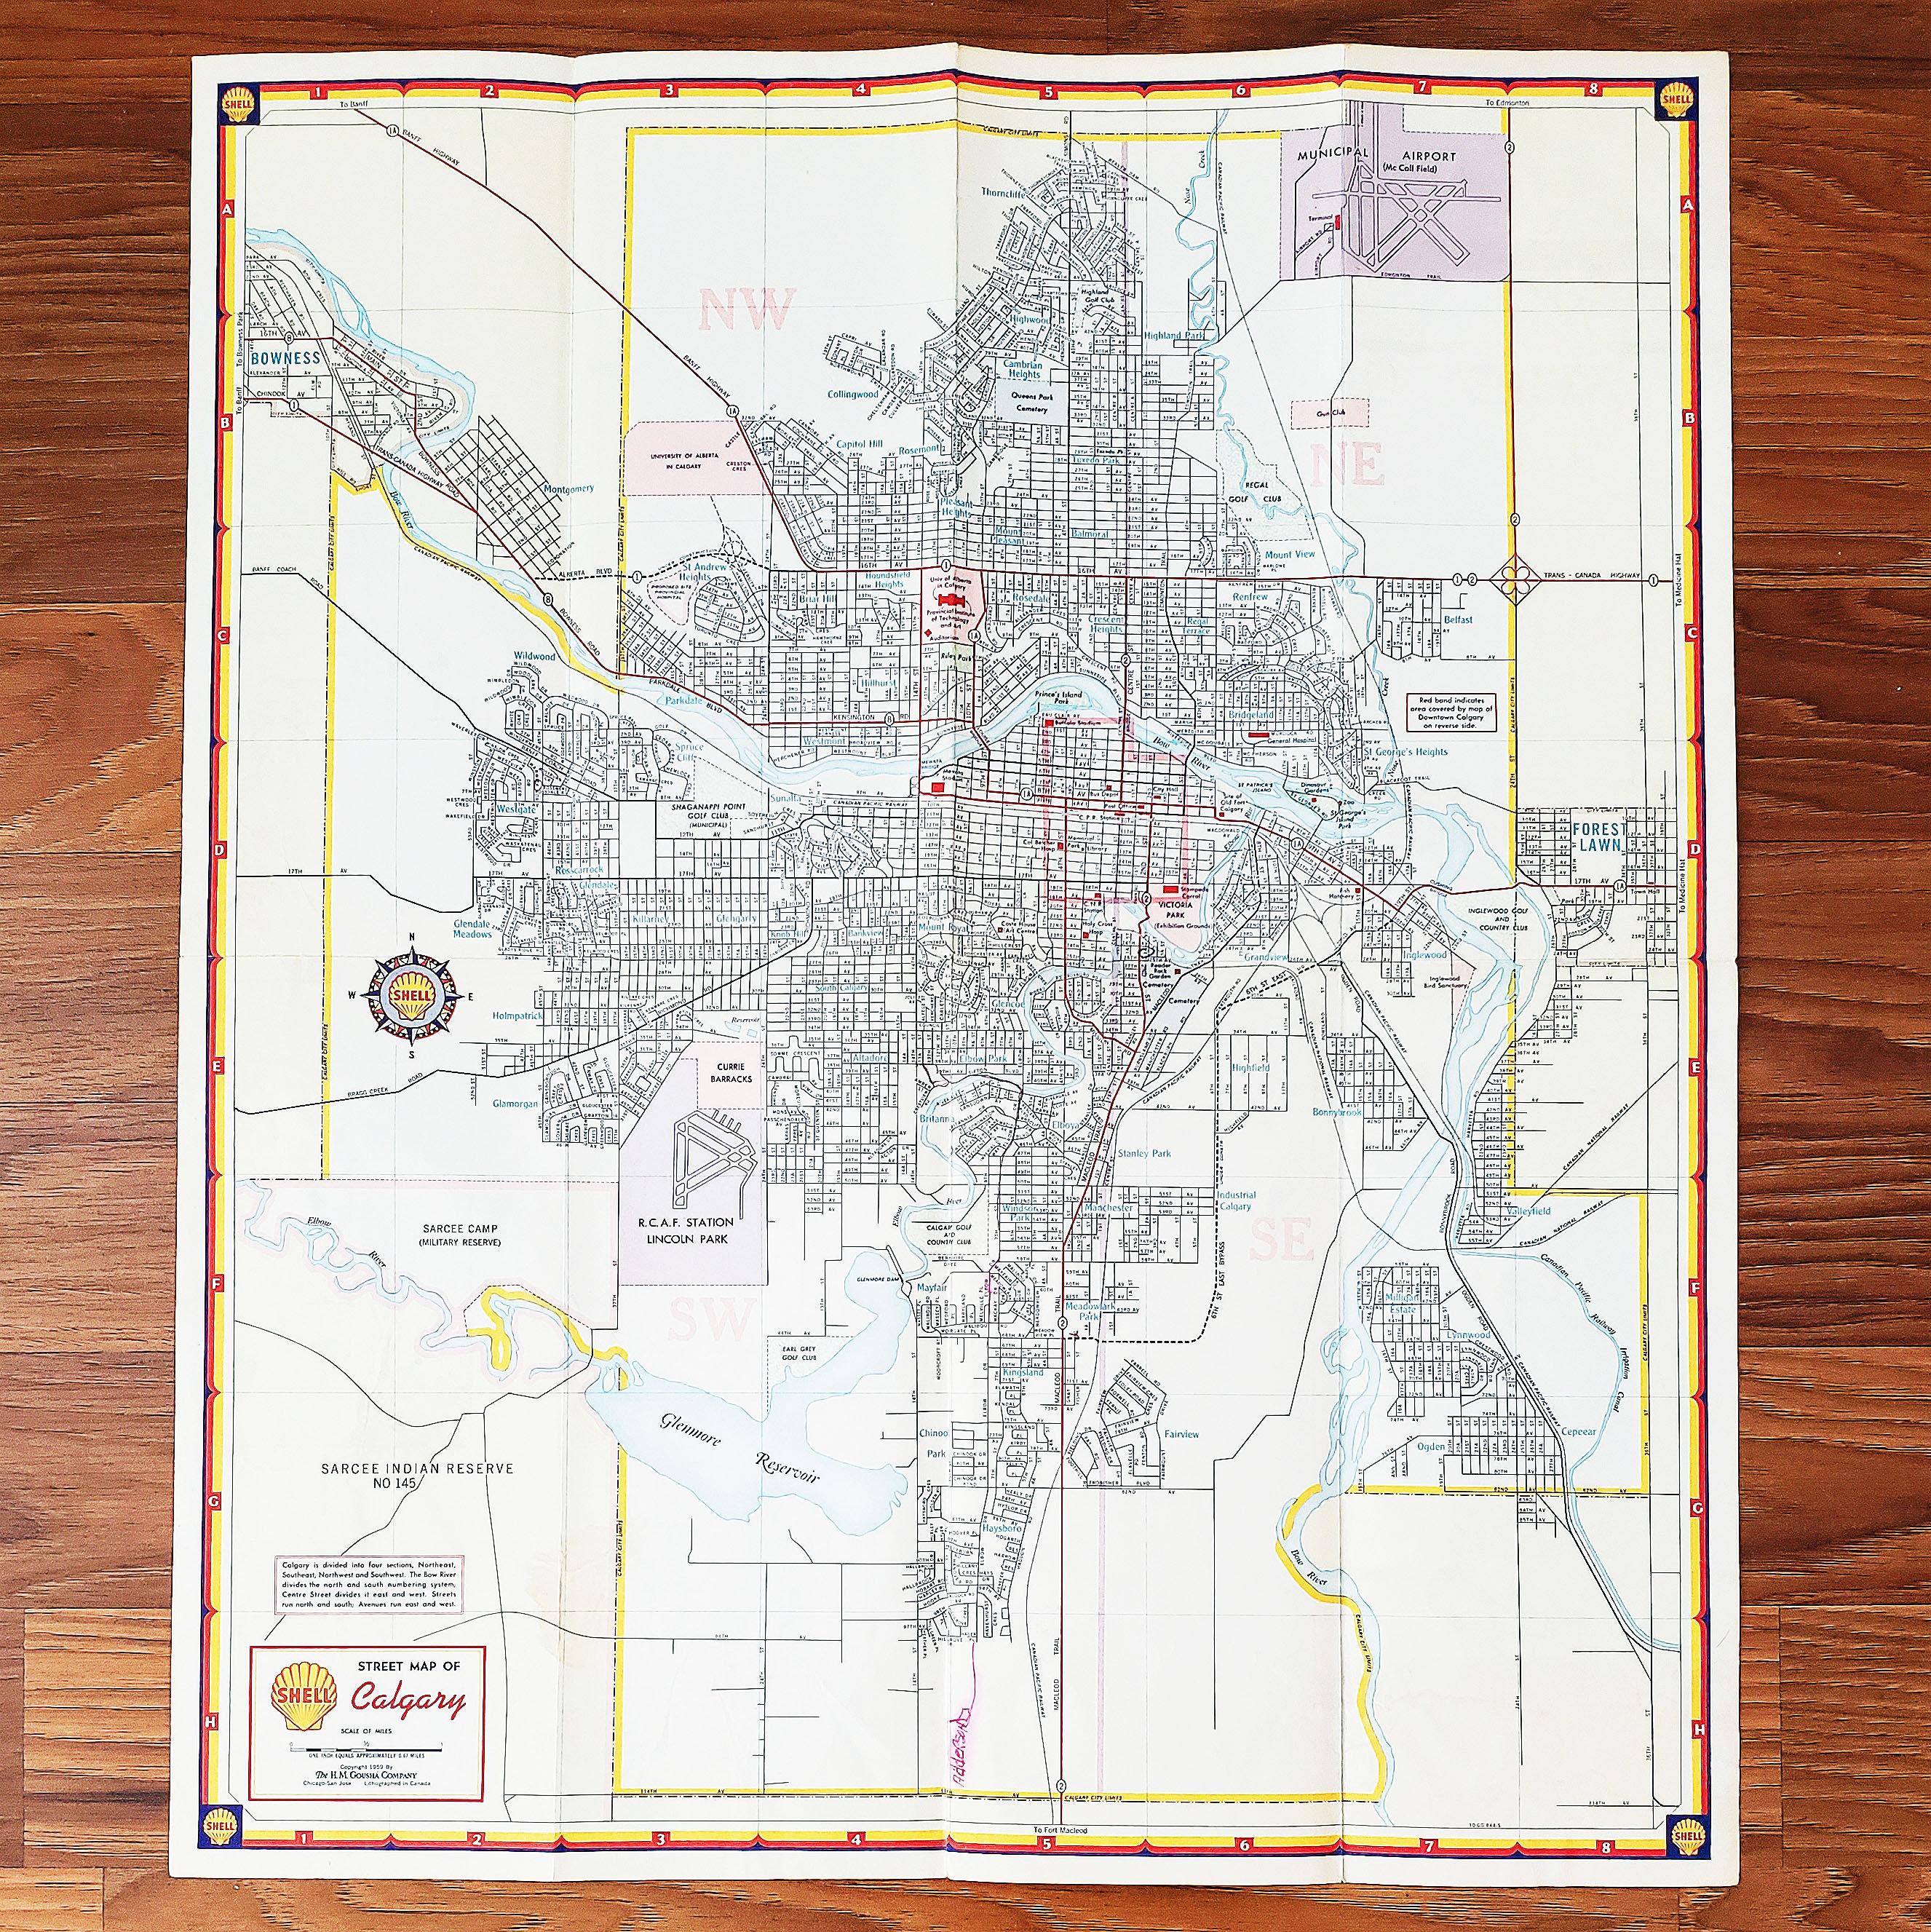 Shell Tankstellen Karte.Menge Von 5 Jahrgang 1950 S Shell Tankstelle Karten Kanadischen Shell öl Karten